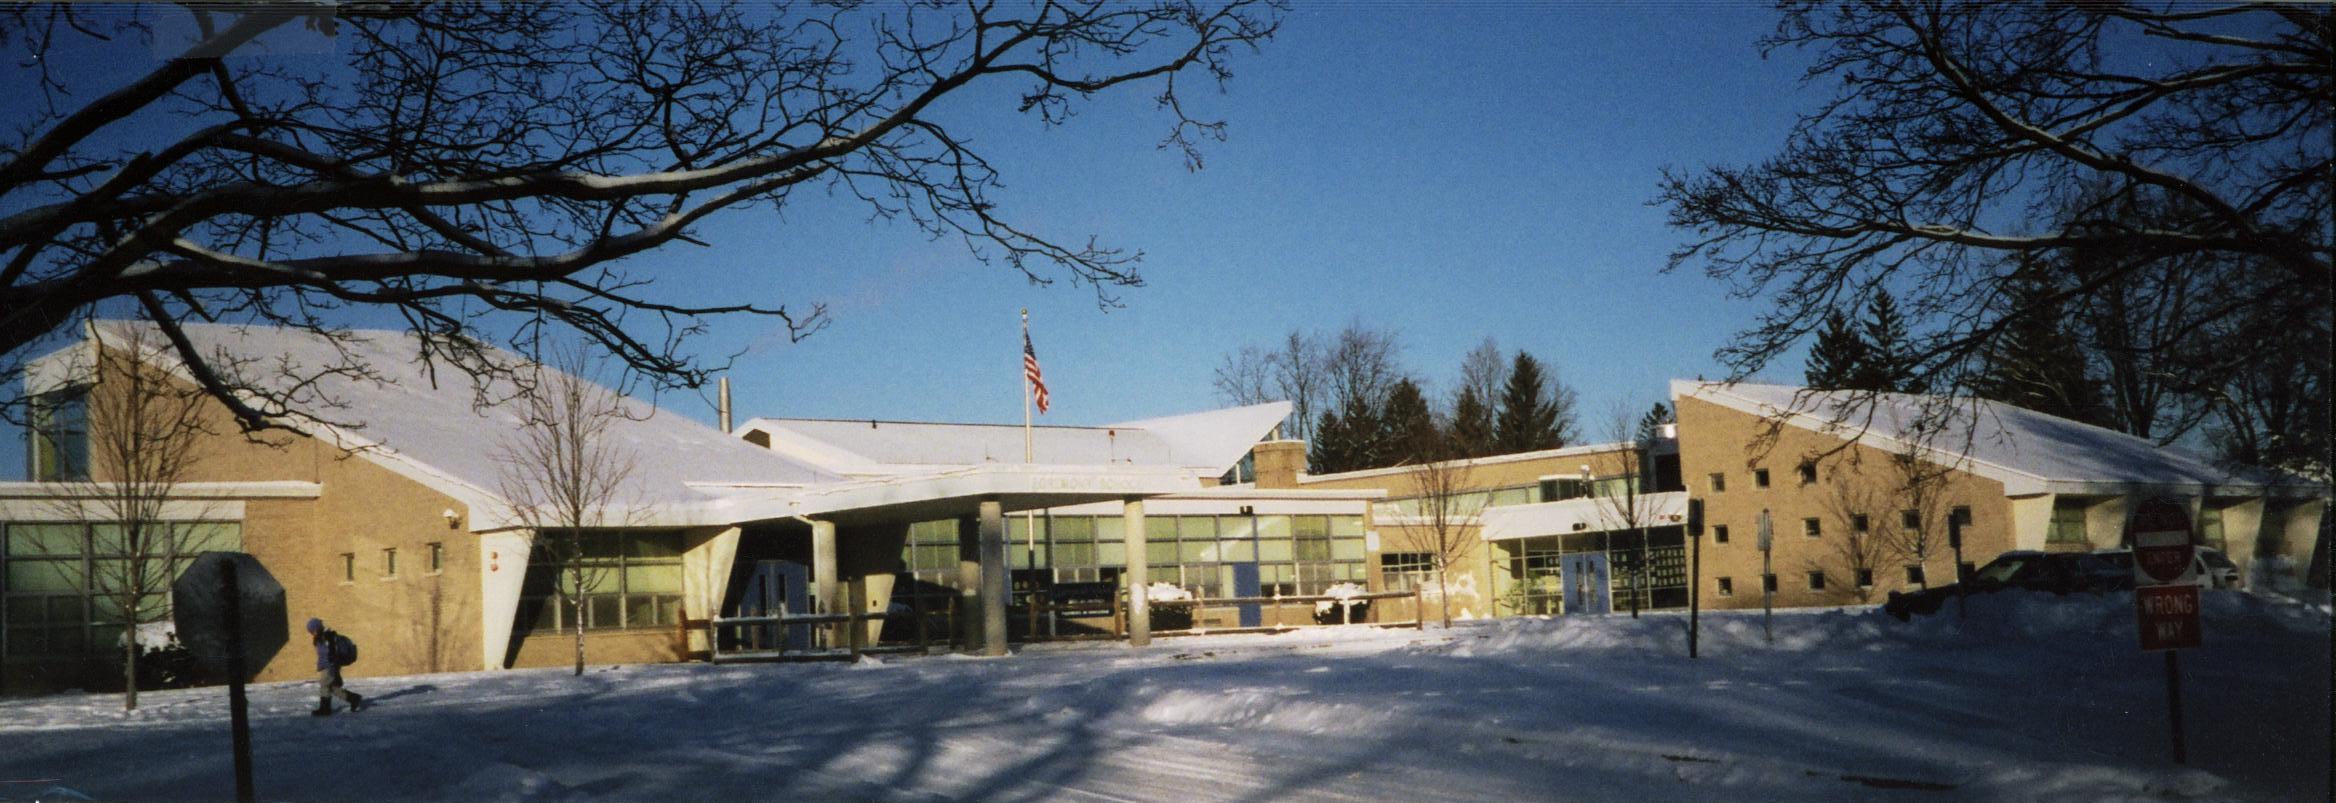 Egremont Elementary School, Pittsfield, Massachusetts